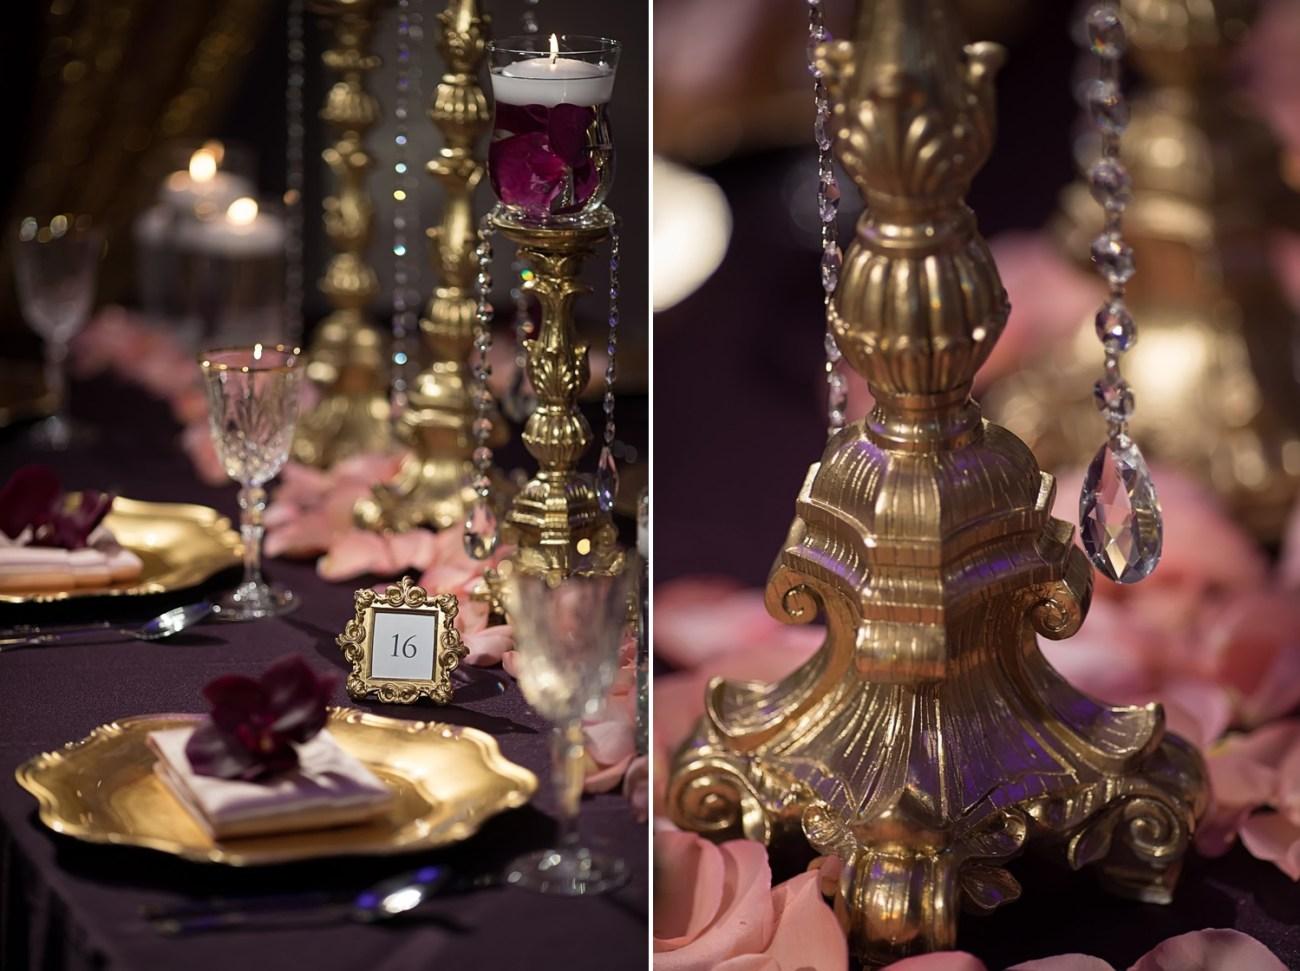 indian-wedding-reception-decor-1-15 Purple Orchids - Reception Indian Wedding Decor